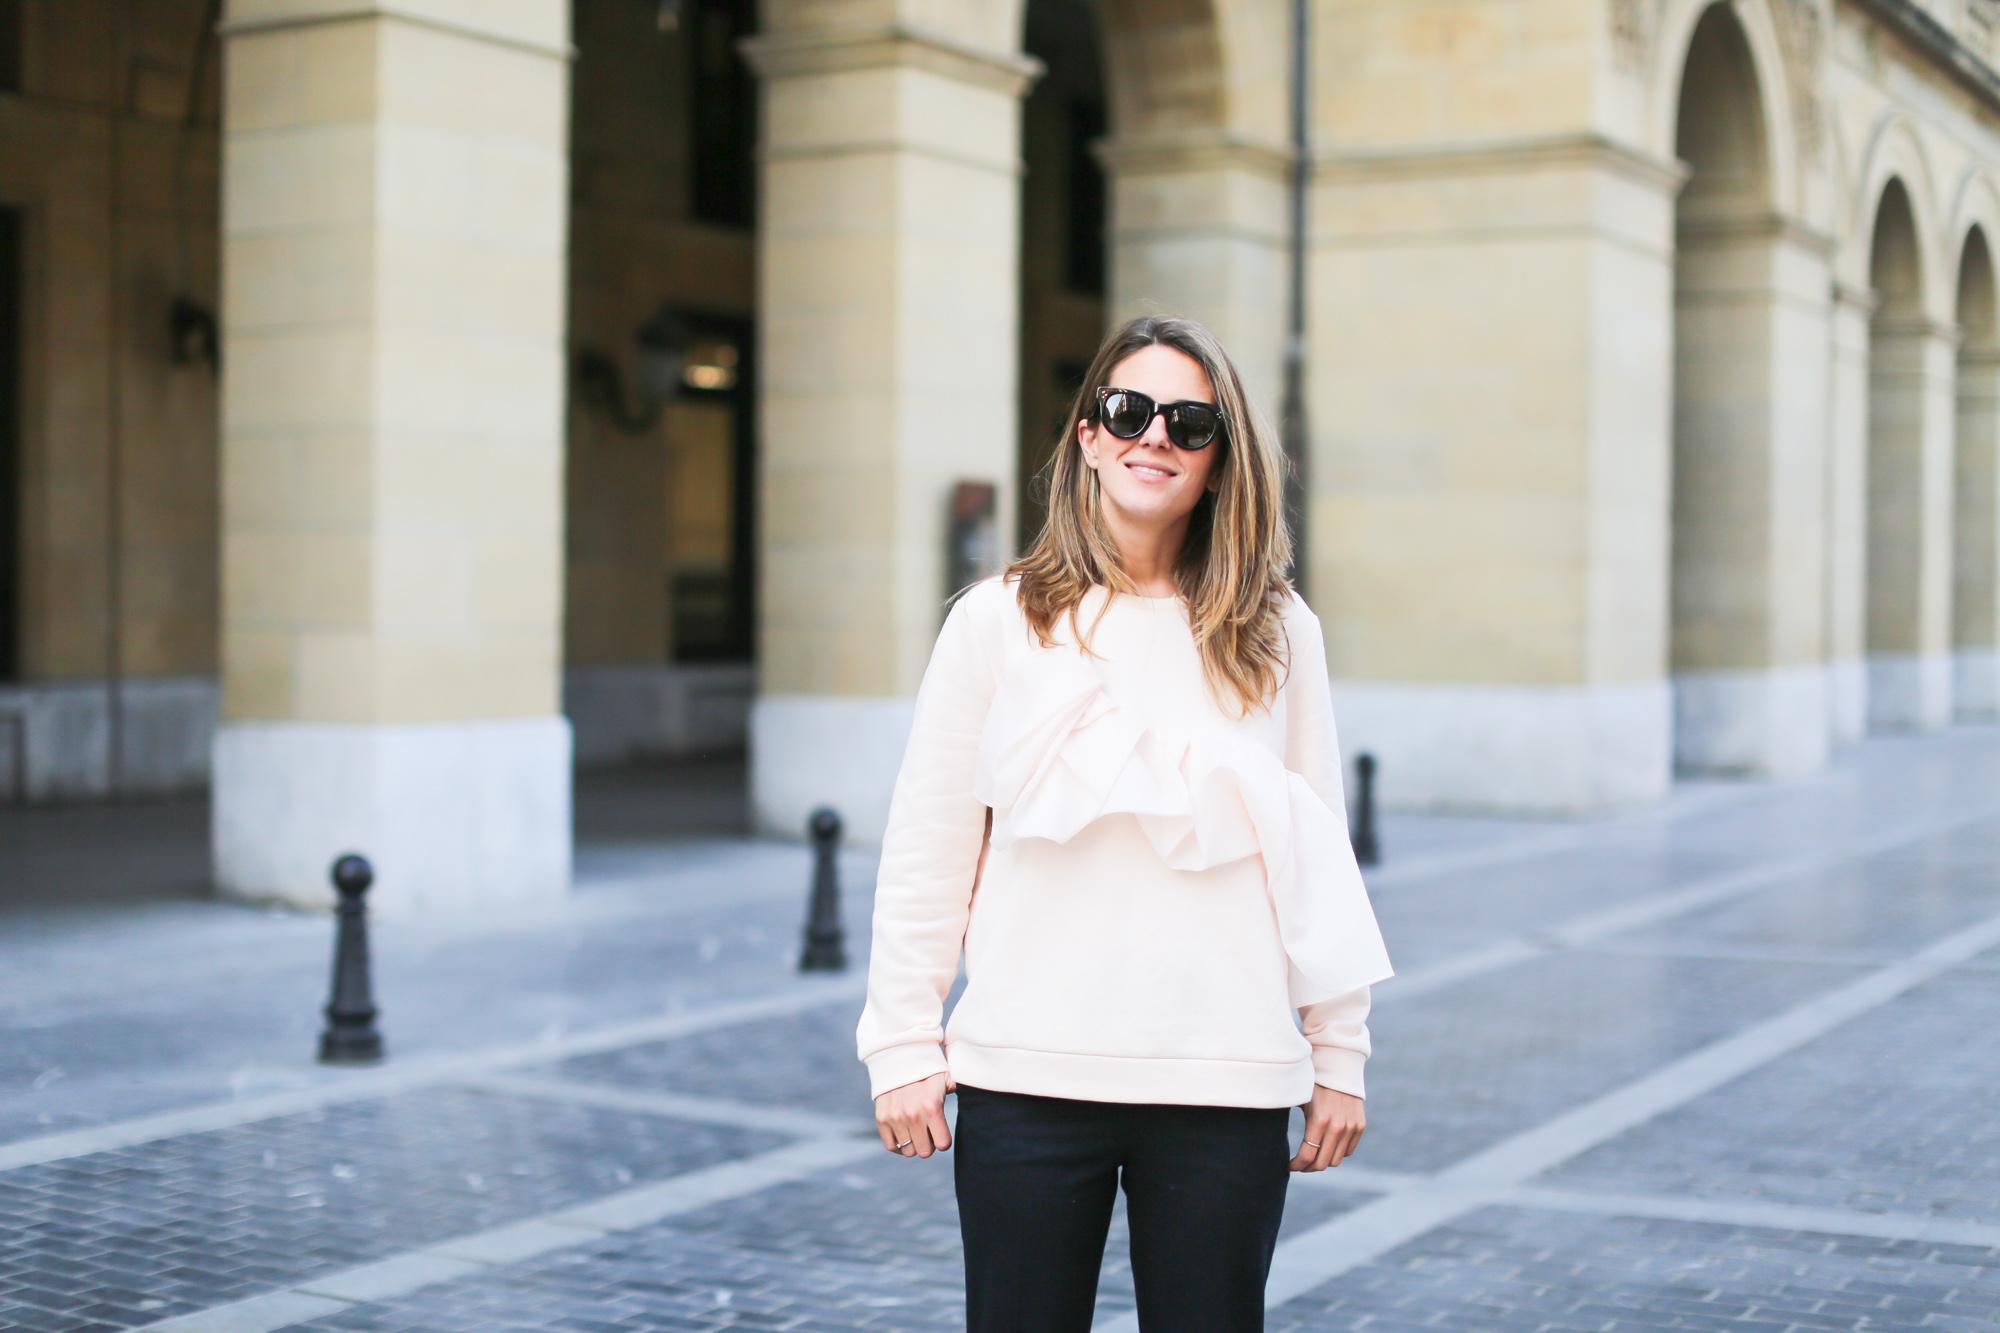 Clochet_streetstyle_fashionblogger_sudaderanudevolanteCOS_pantaloneschinoslanaCOS_adidasSambablancas-4